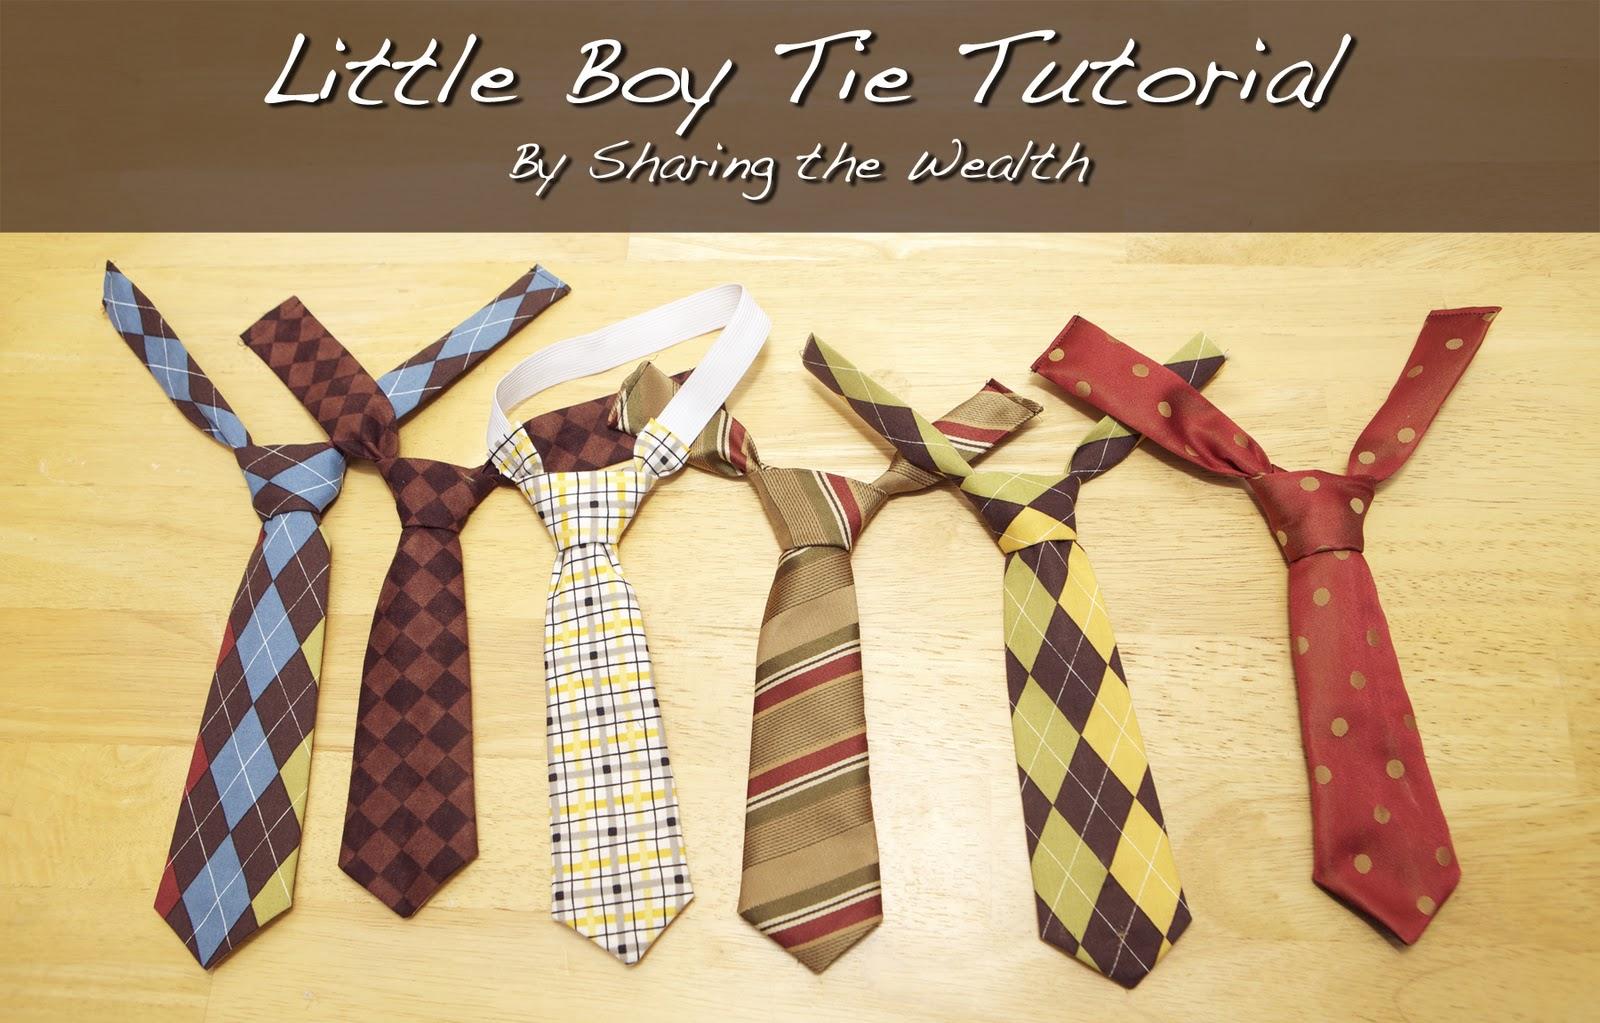 sharing the wealth little boy tie tutorial